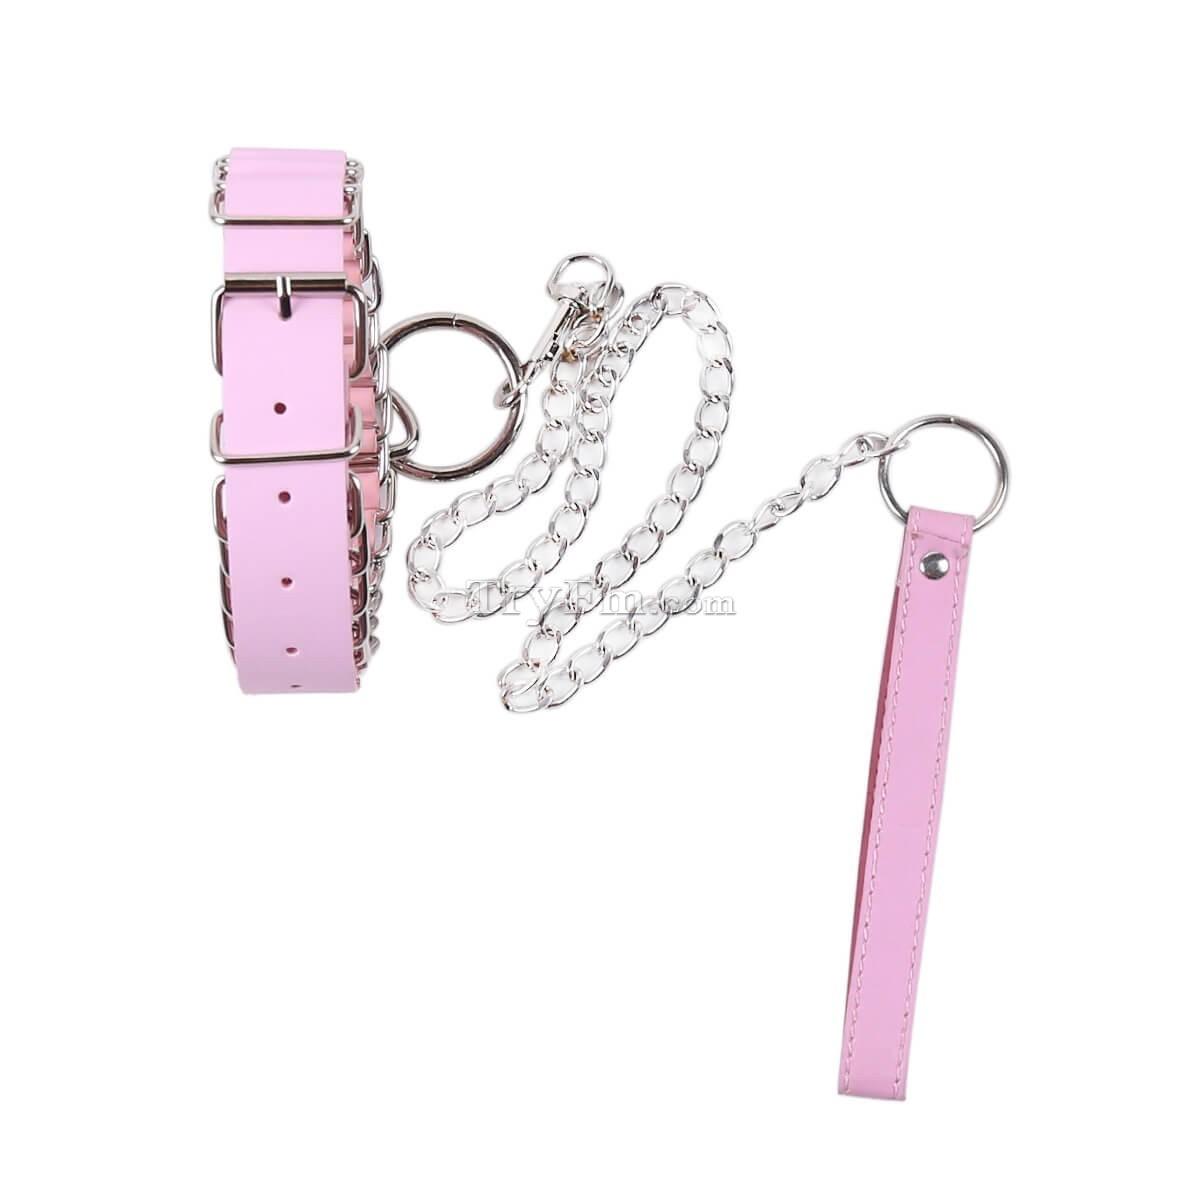 1-sex-slave-collar2.jpg